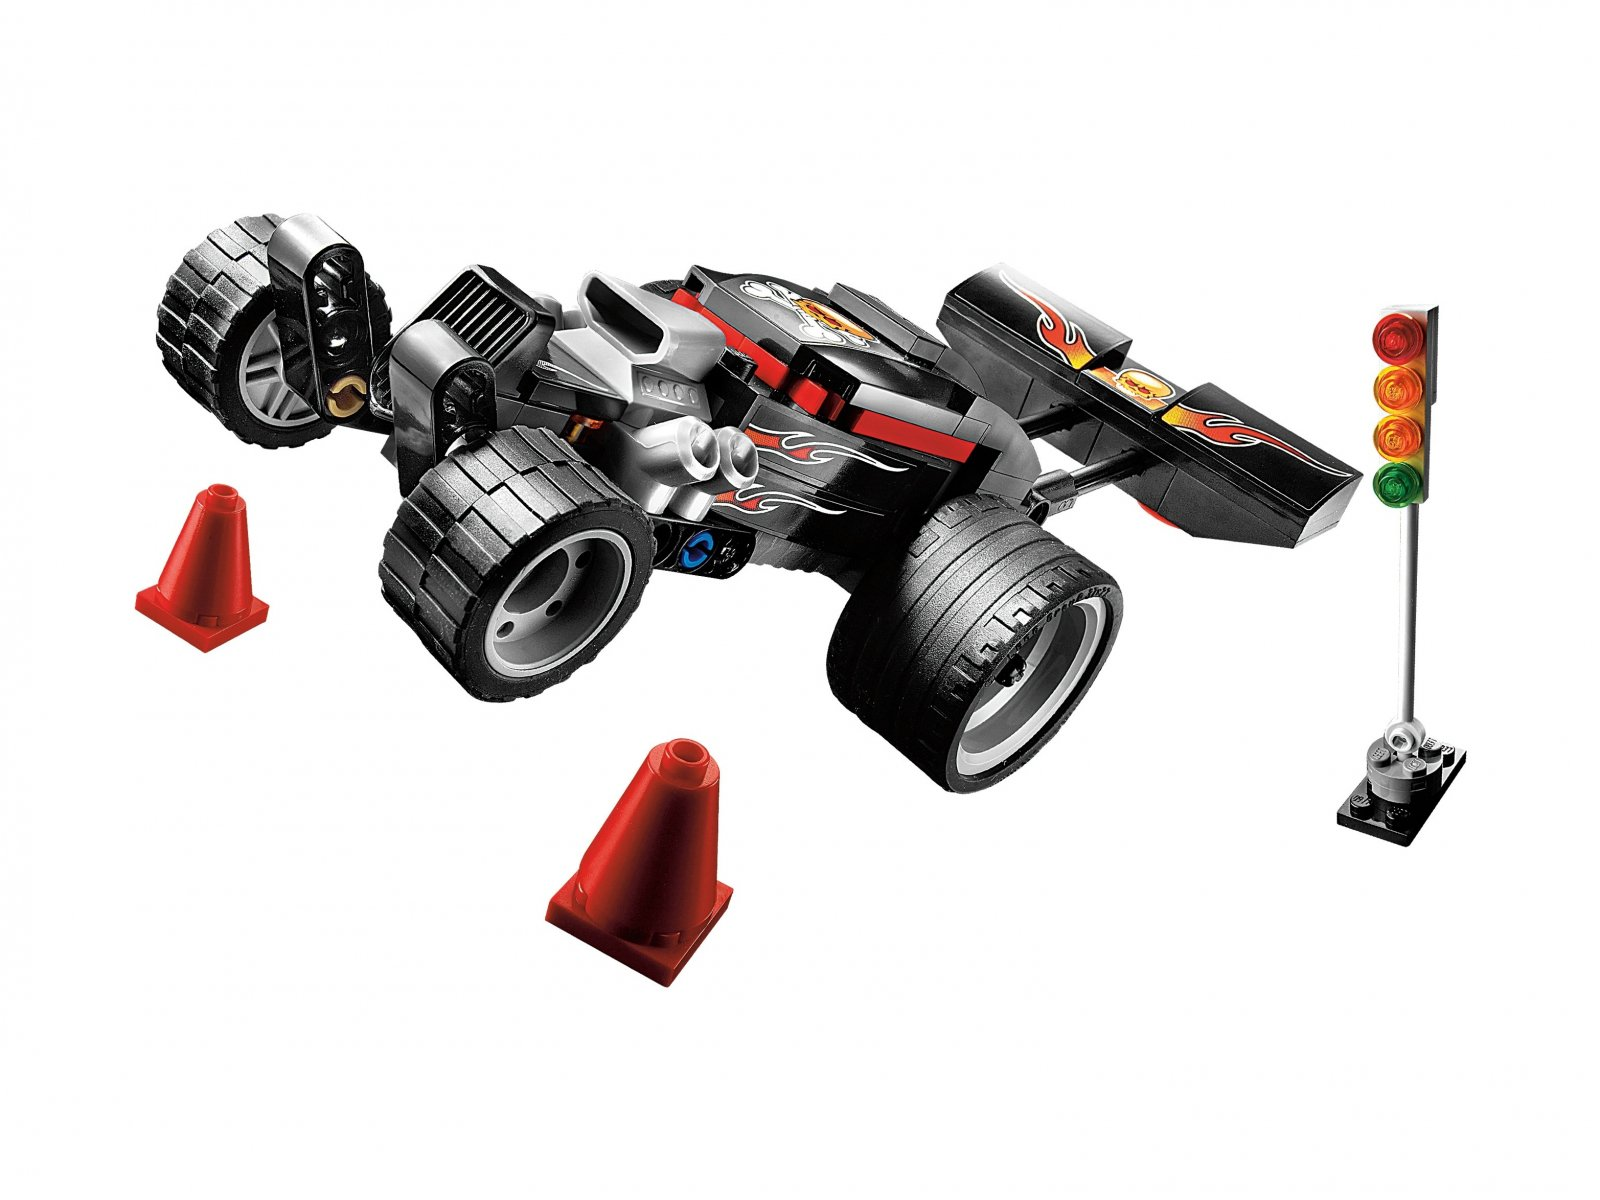 LEGO Racers Extreme Wheelie 8164